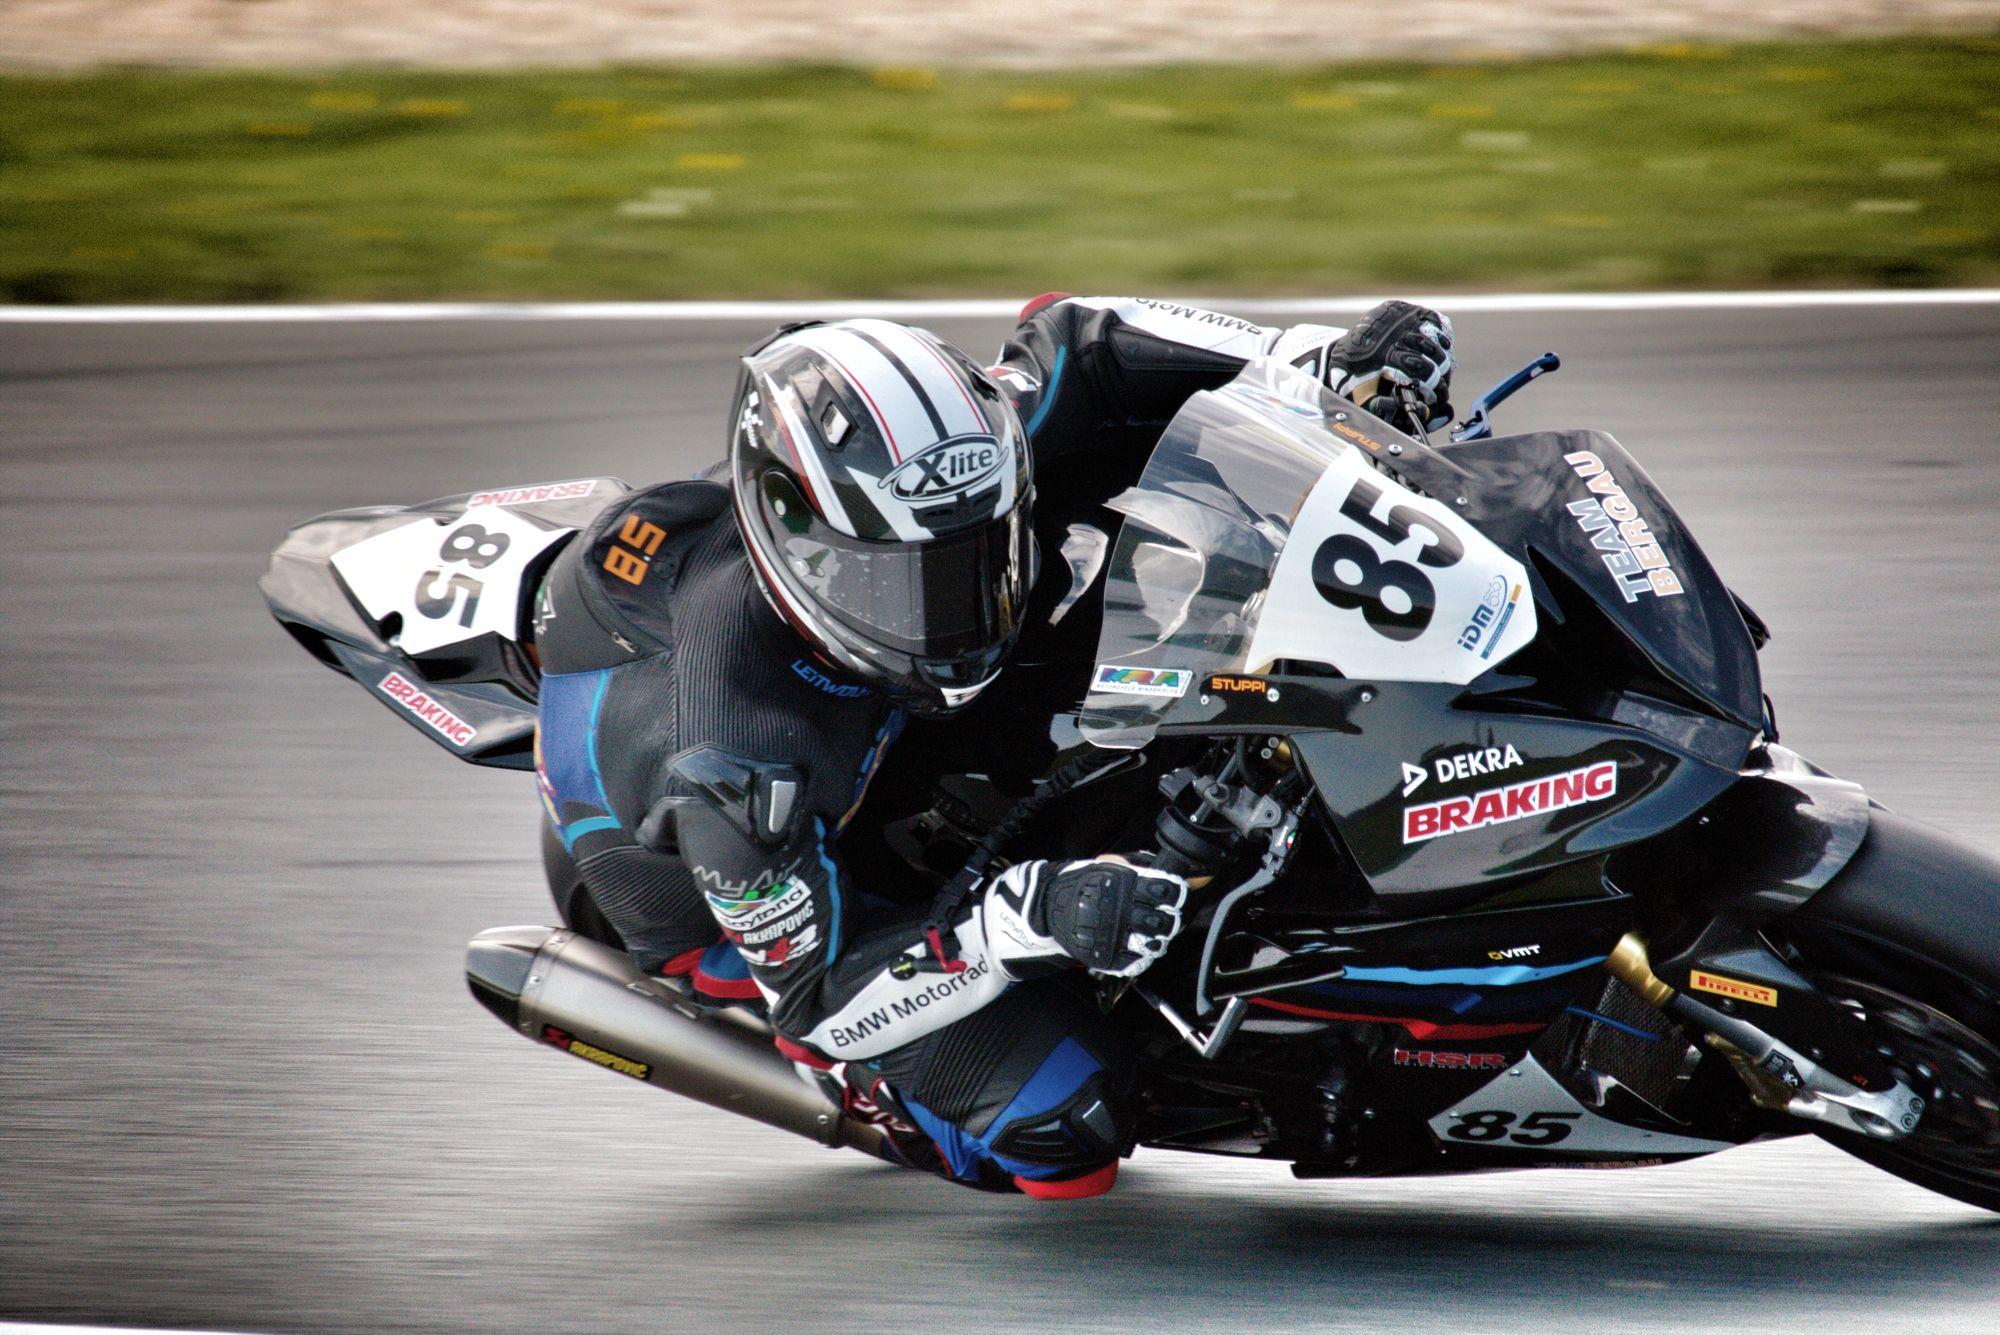 IDM 2018 Motorsportarena Oschersleben - Björn Stuppi - Team Bergau